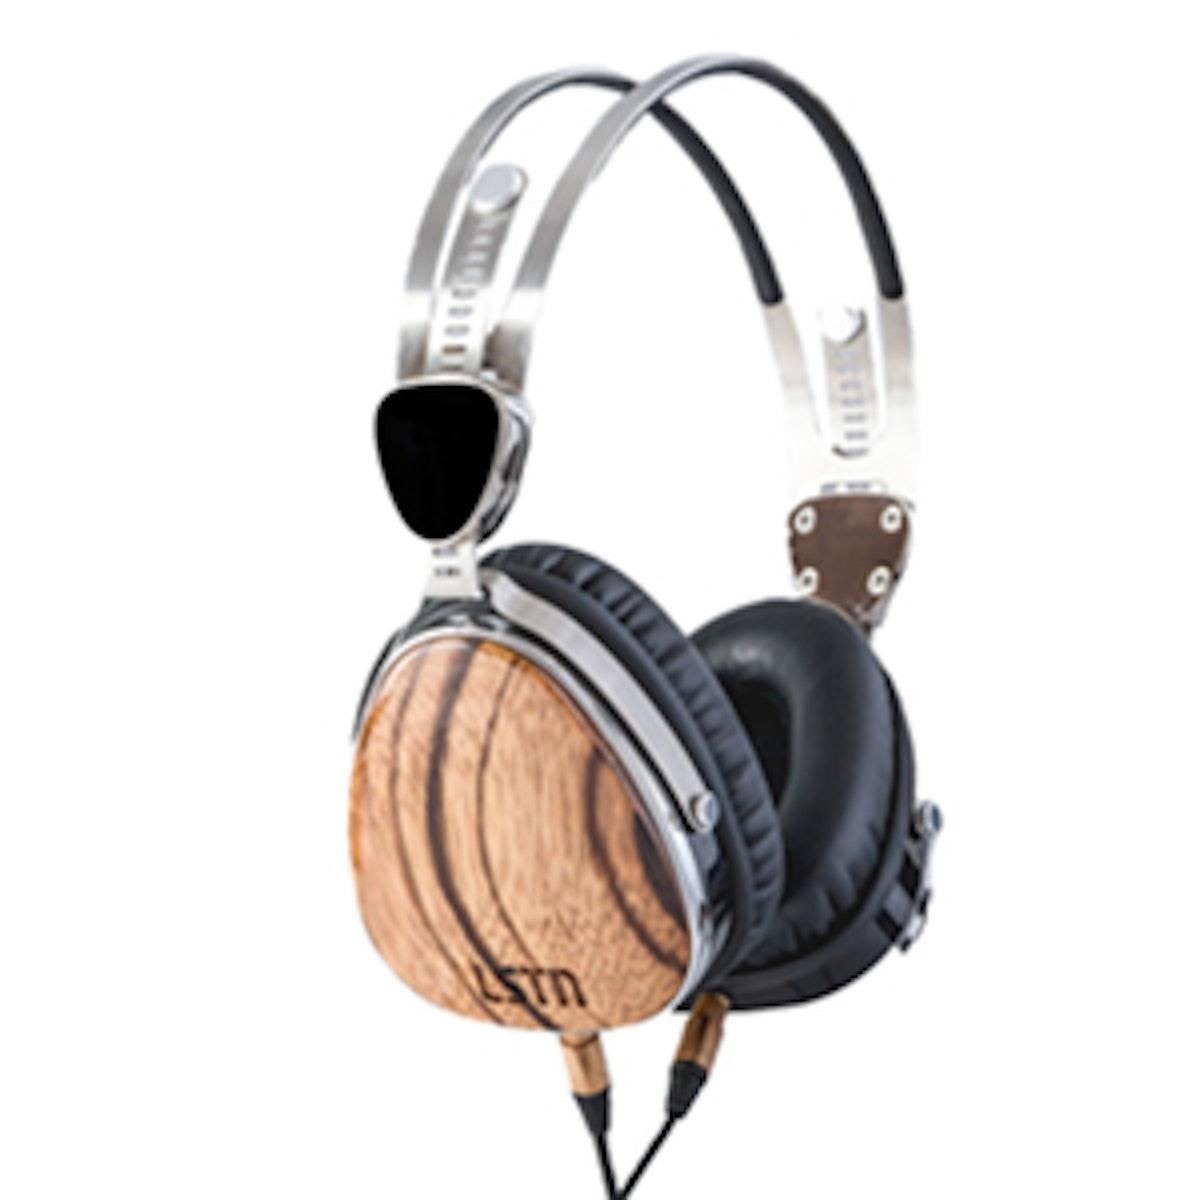 Zebra Wood Headphones